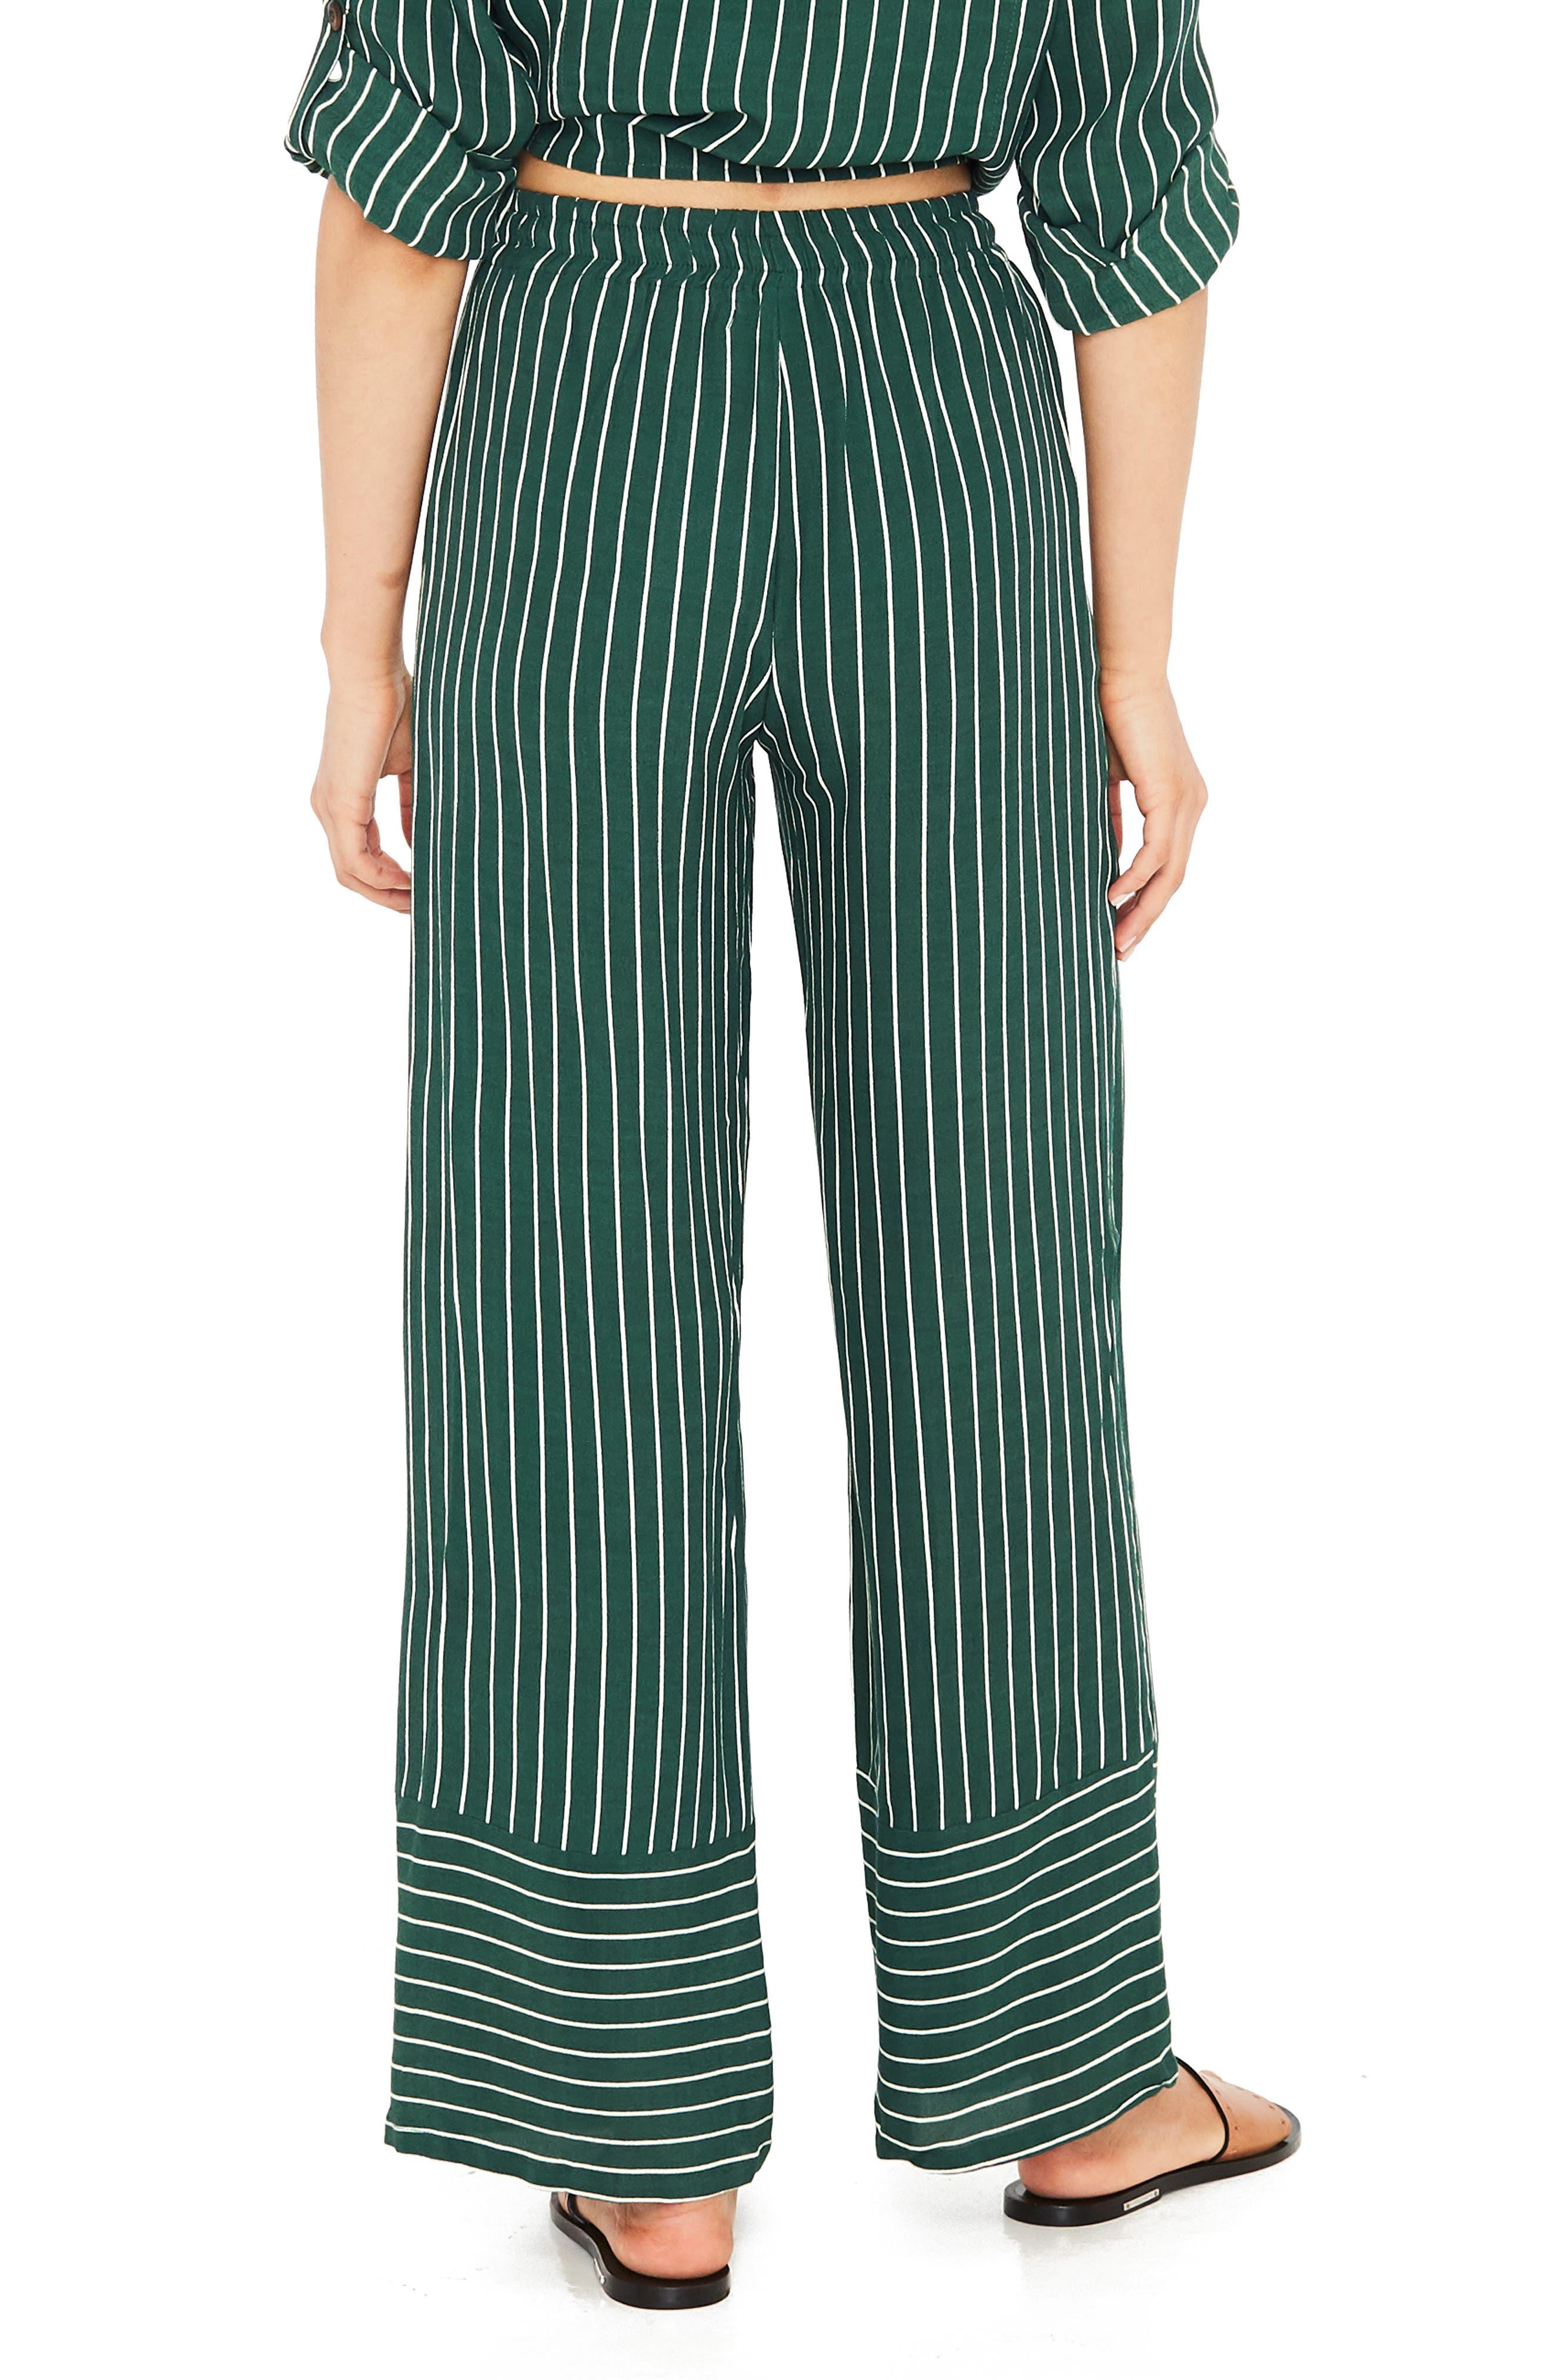 Havana High Waist Stripe Pants,                             Alternate thumbnail 2, color,                             PASEO STRIPE